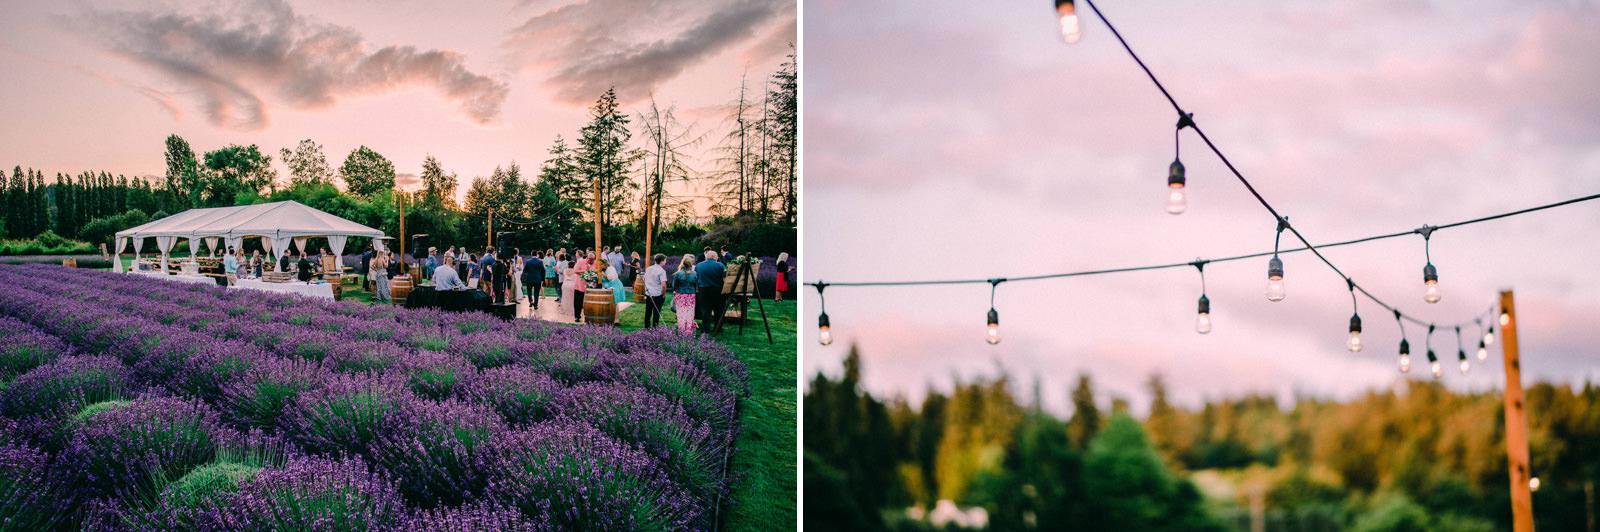 105-woodinville-lavendar-farm-wedding-with-golden-glowy-photos.jpg